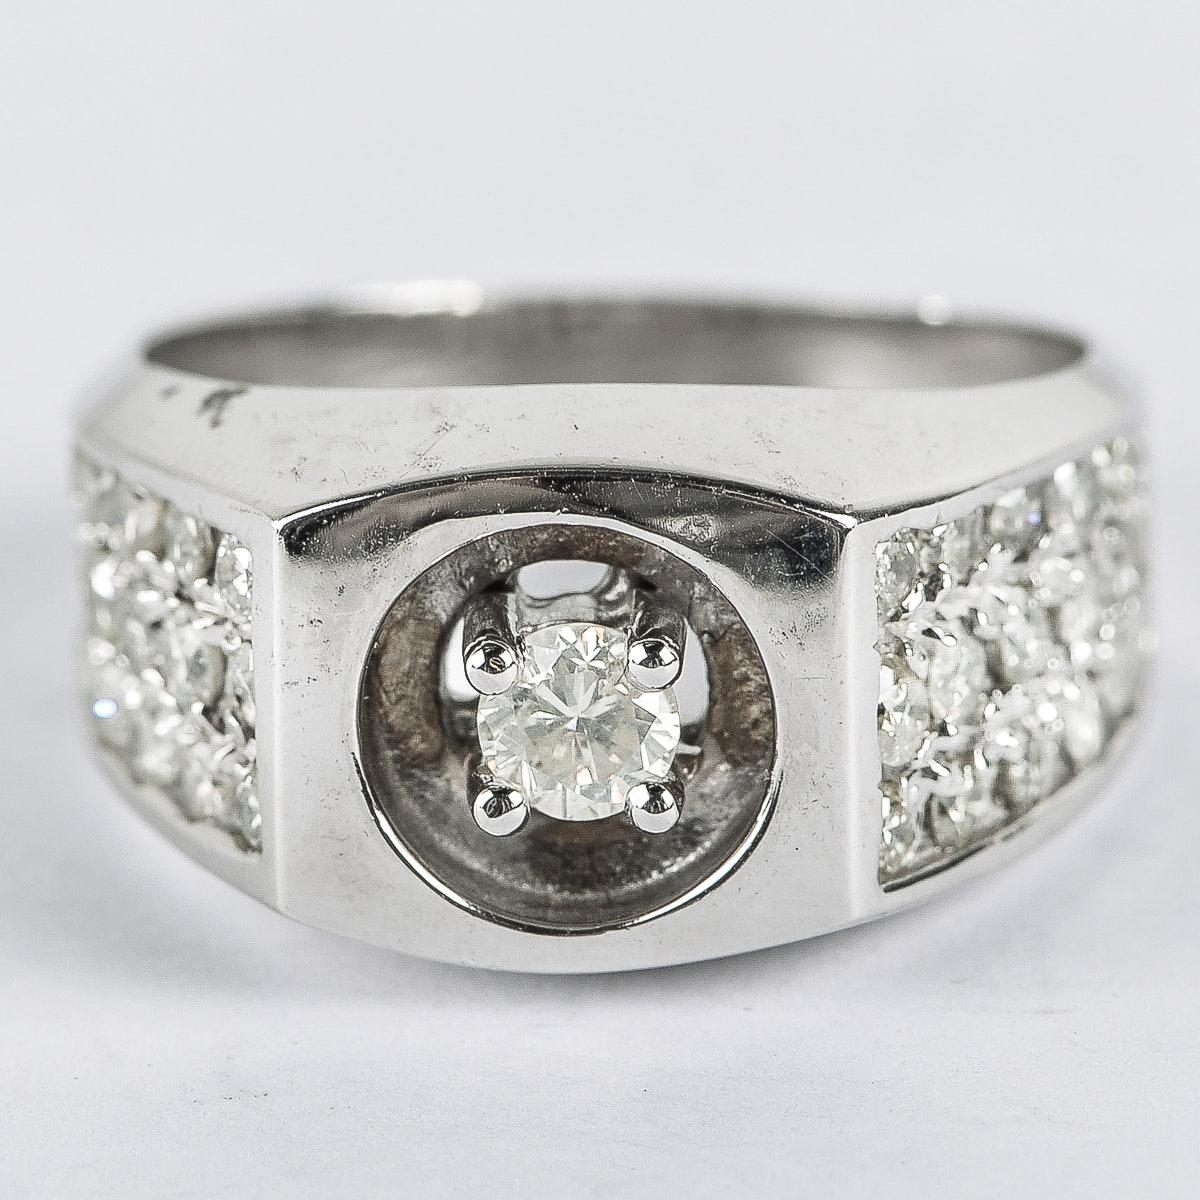 Men's 14K White Gold and 1.70 CTW Diamond Flat Top Ring